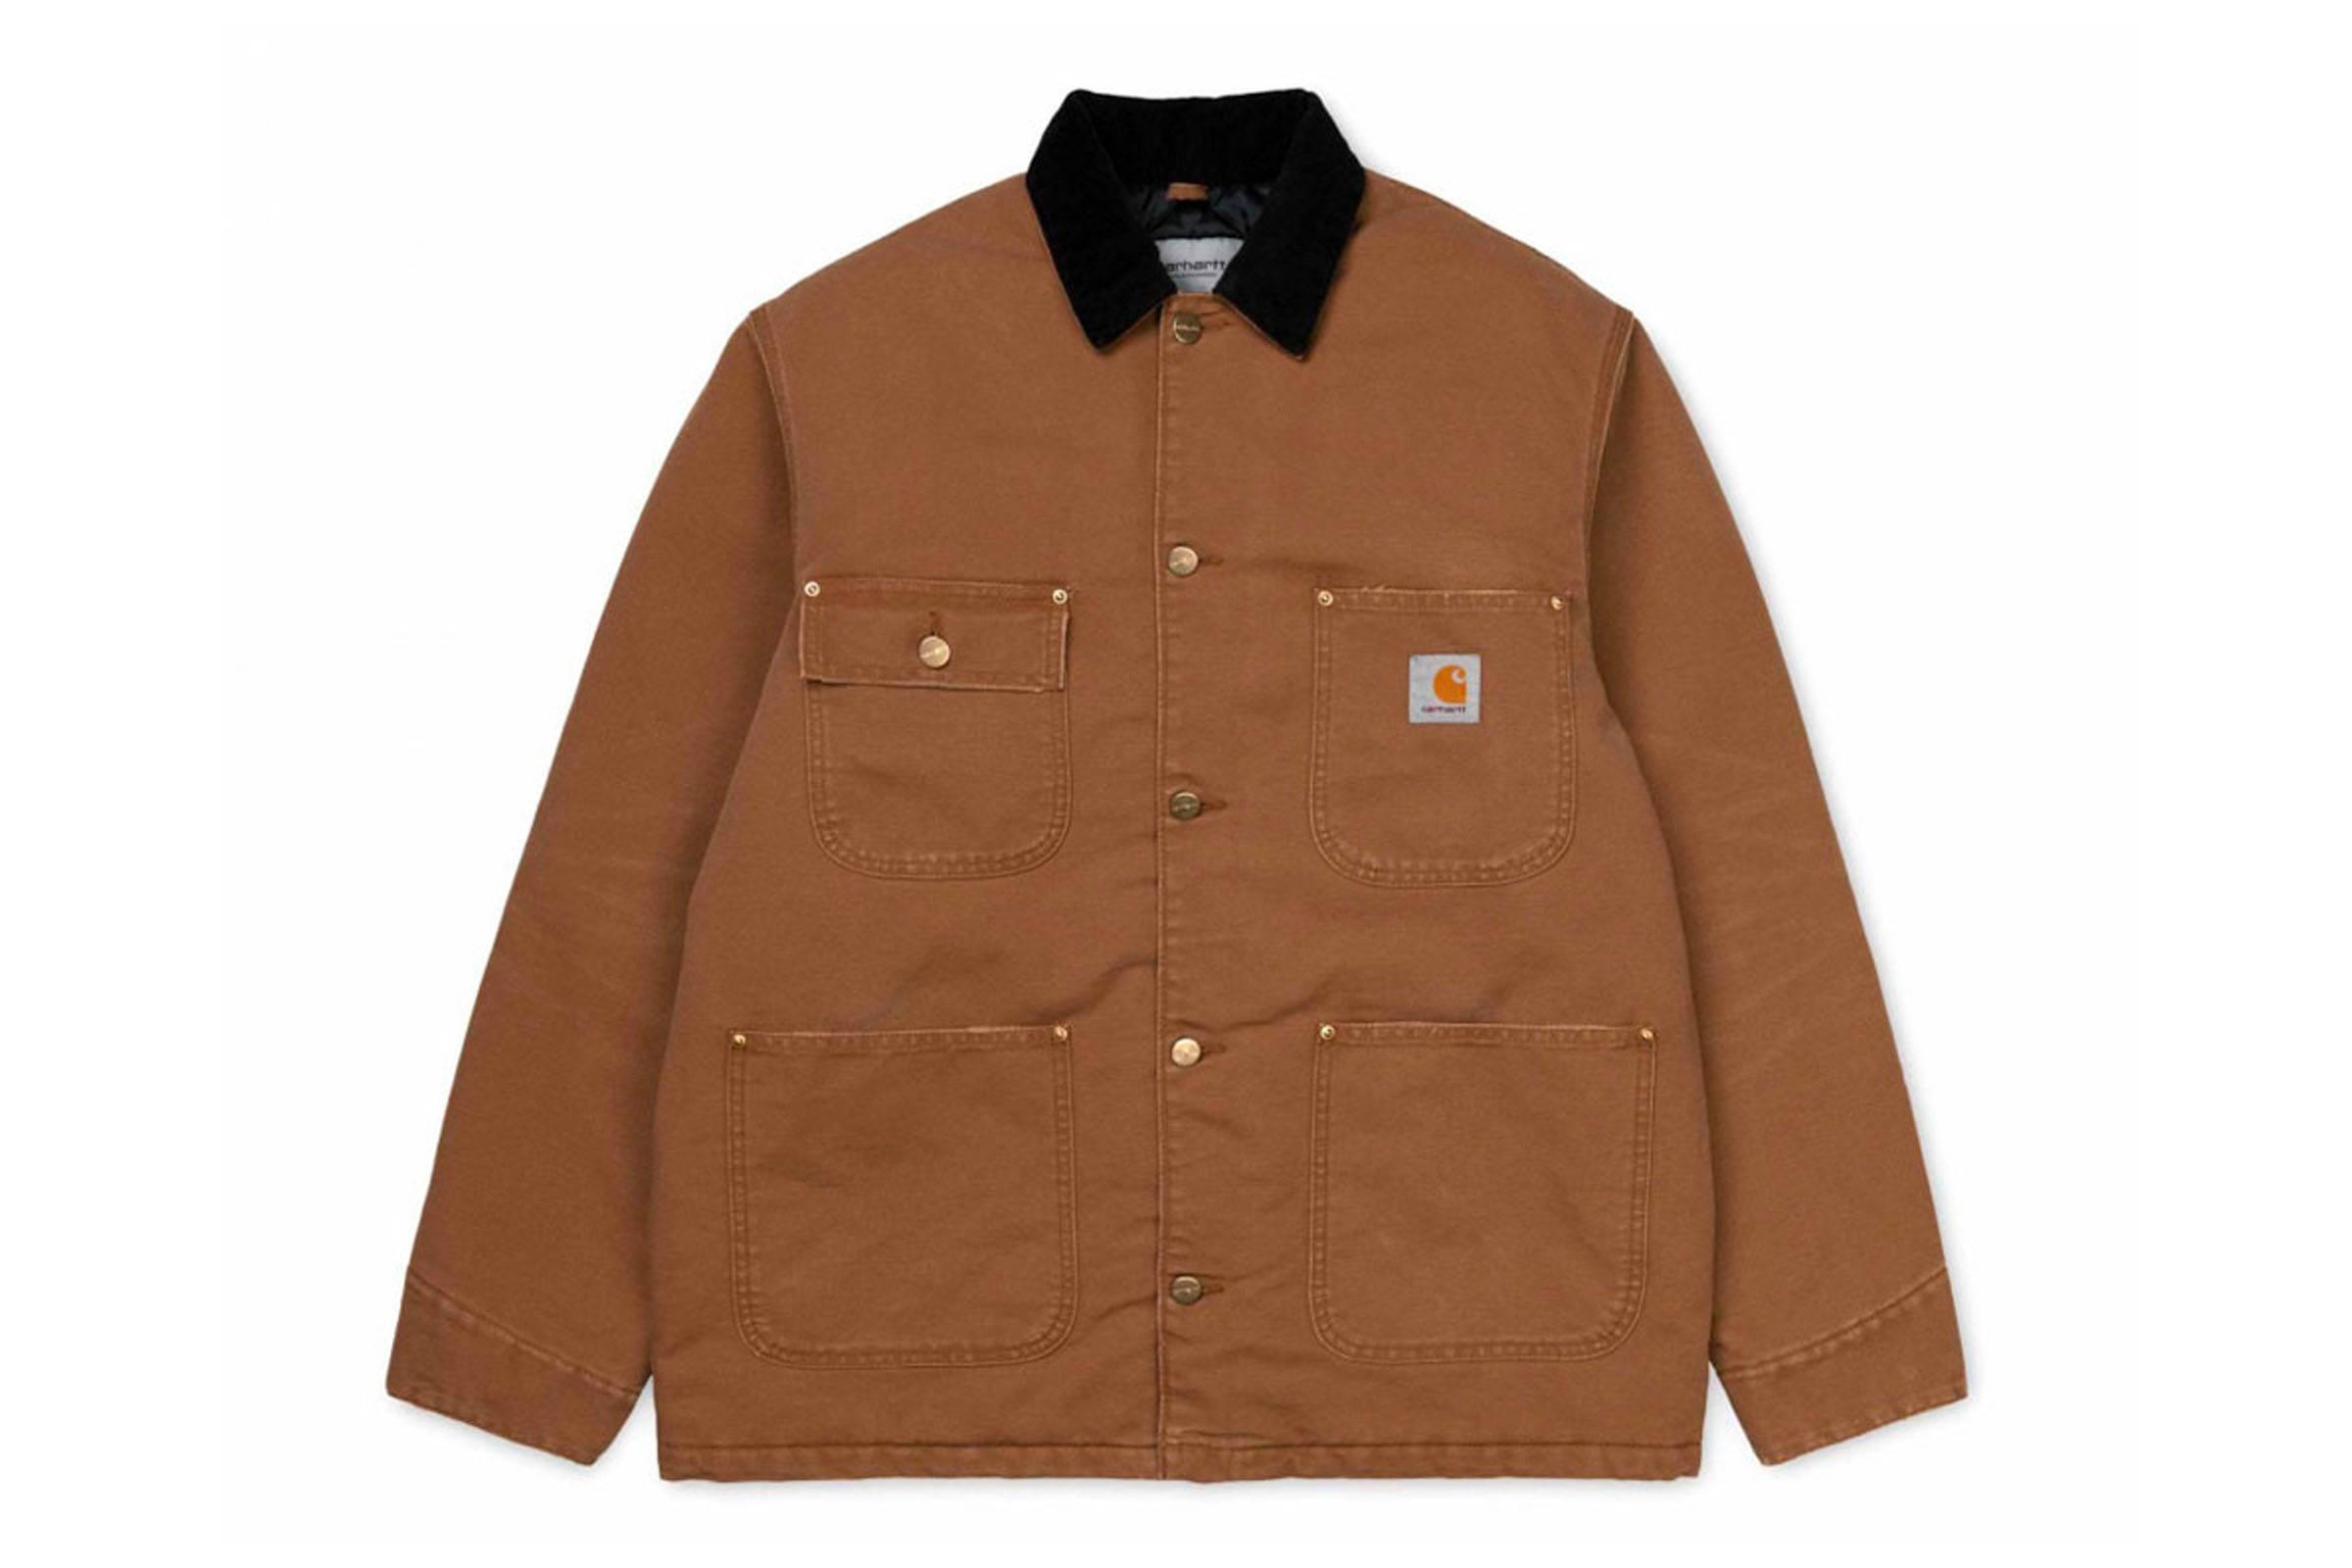 You See This Coat? Vol. 5: Carhartt Chore Coat